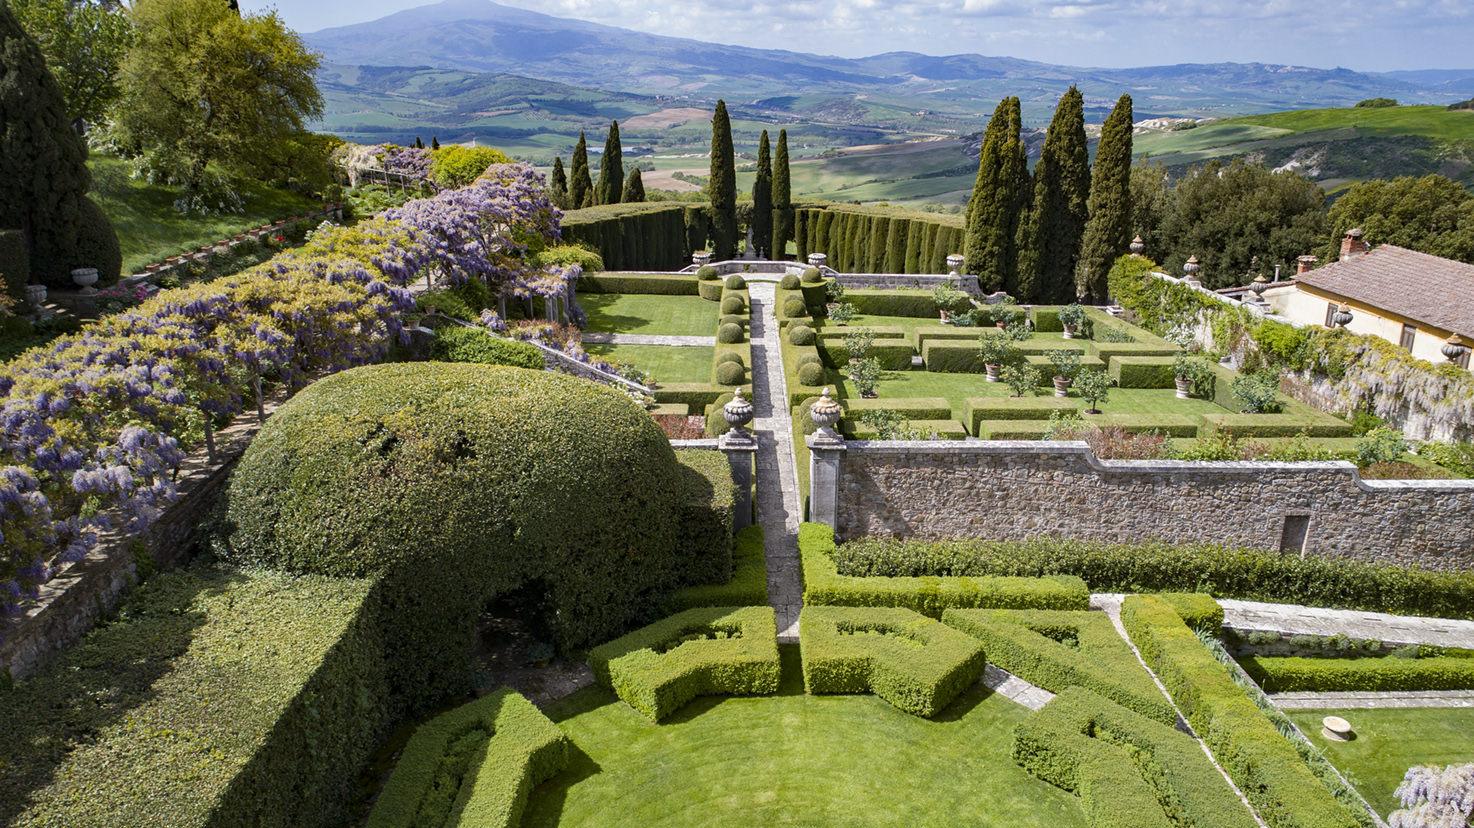 Magnificent Renaissance gardens